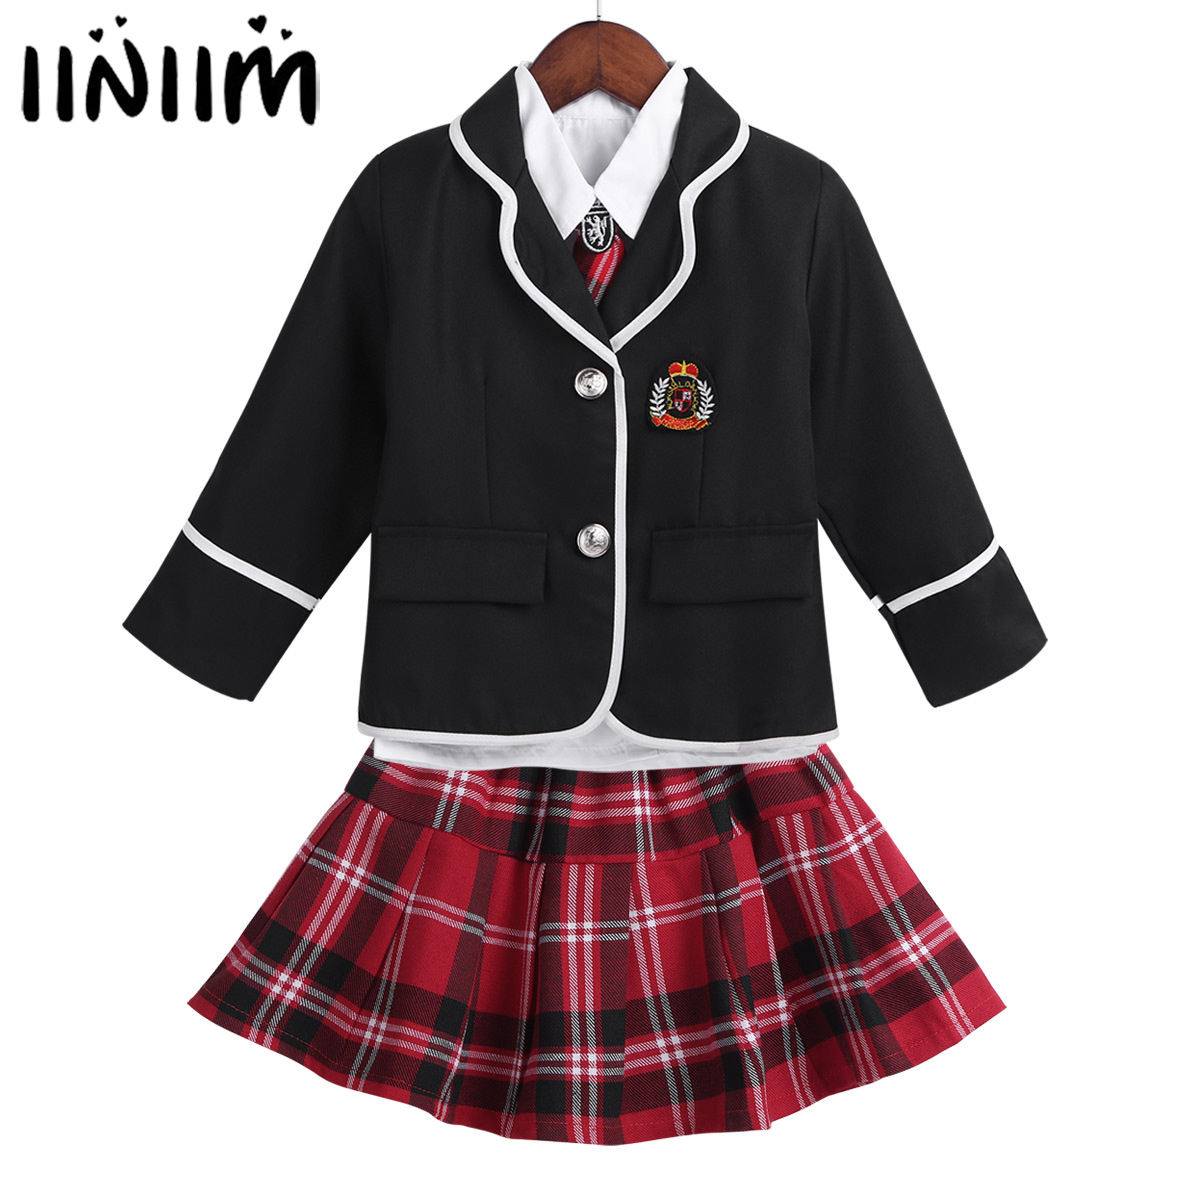 Kids Girls British Style School Uniform Anime Costume Suit Long Sleeve Coat With Shirt Tie Mini Skirt Set